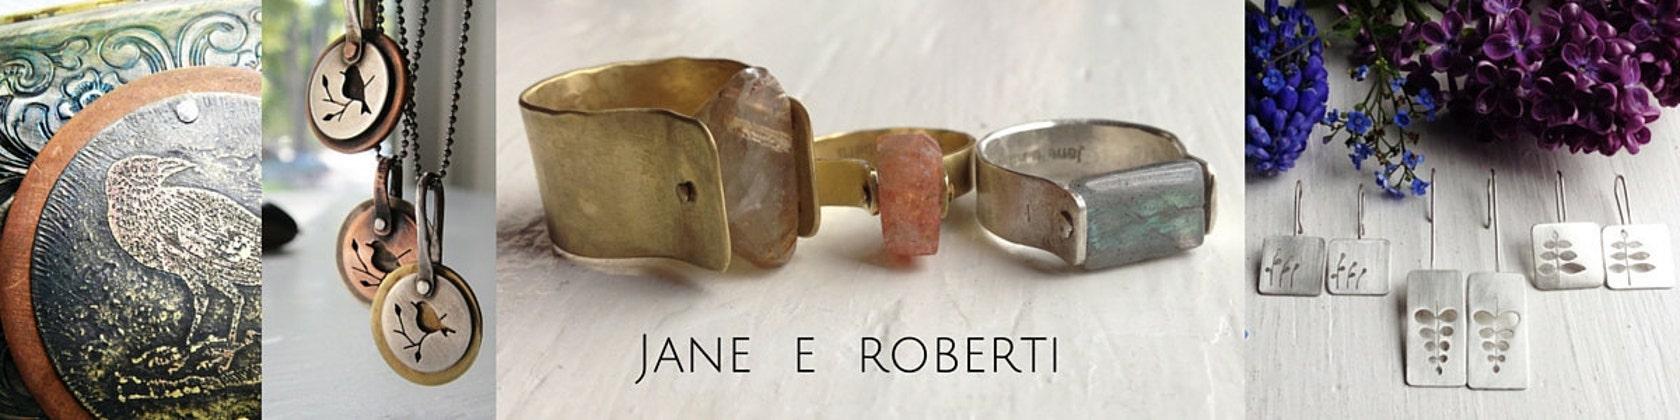 janeeroberti JANE E ROBERTI handcrafted jewelry u0026